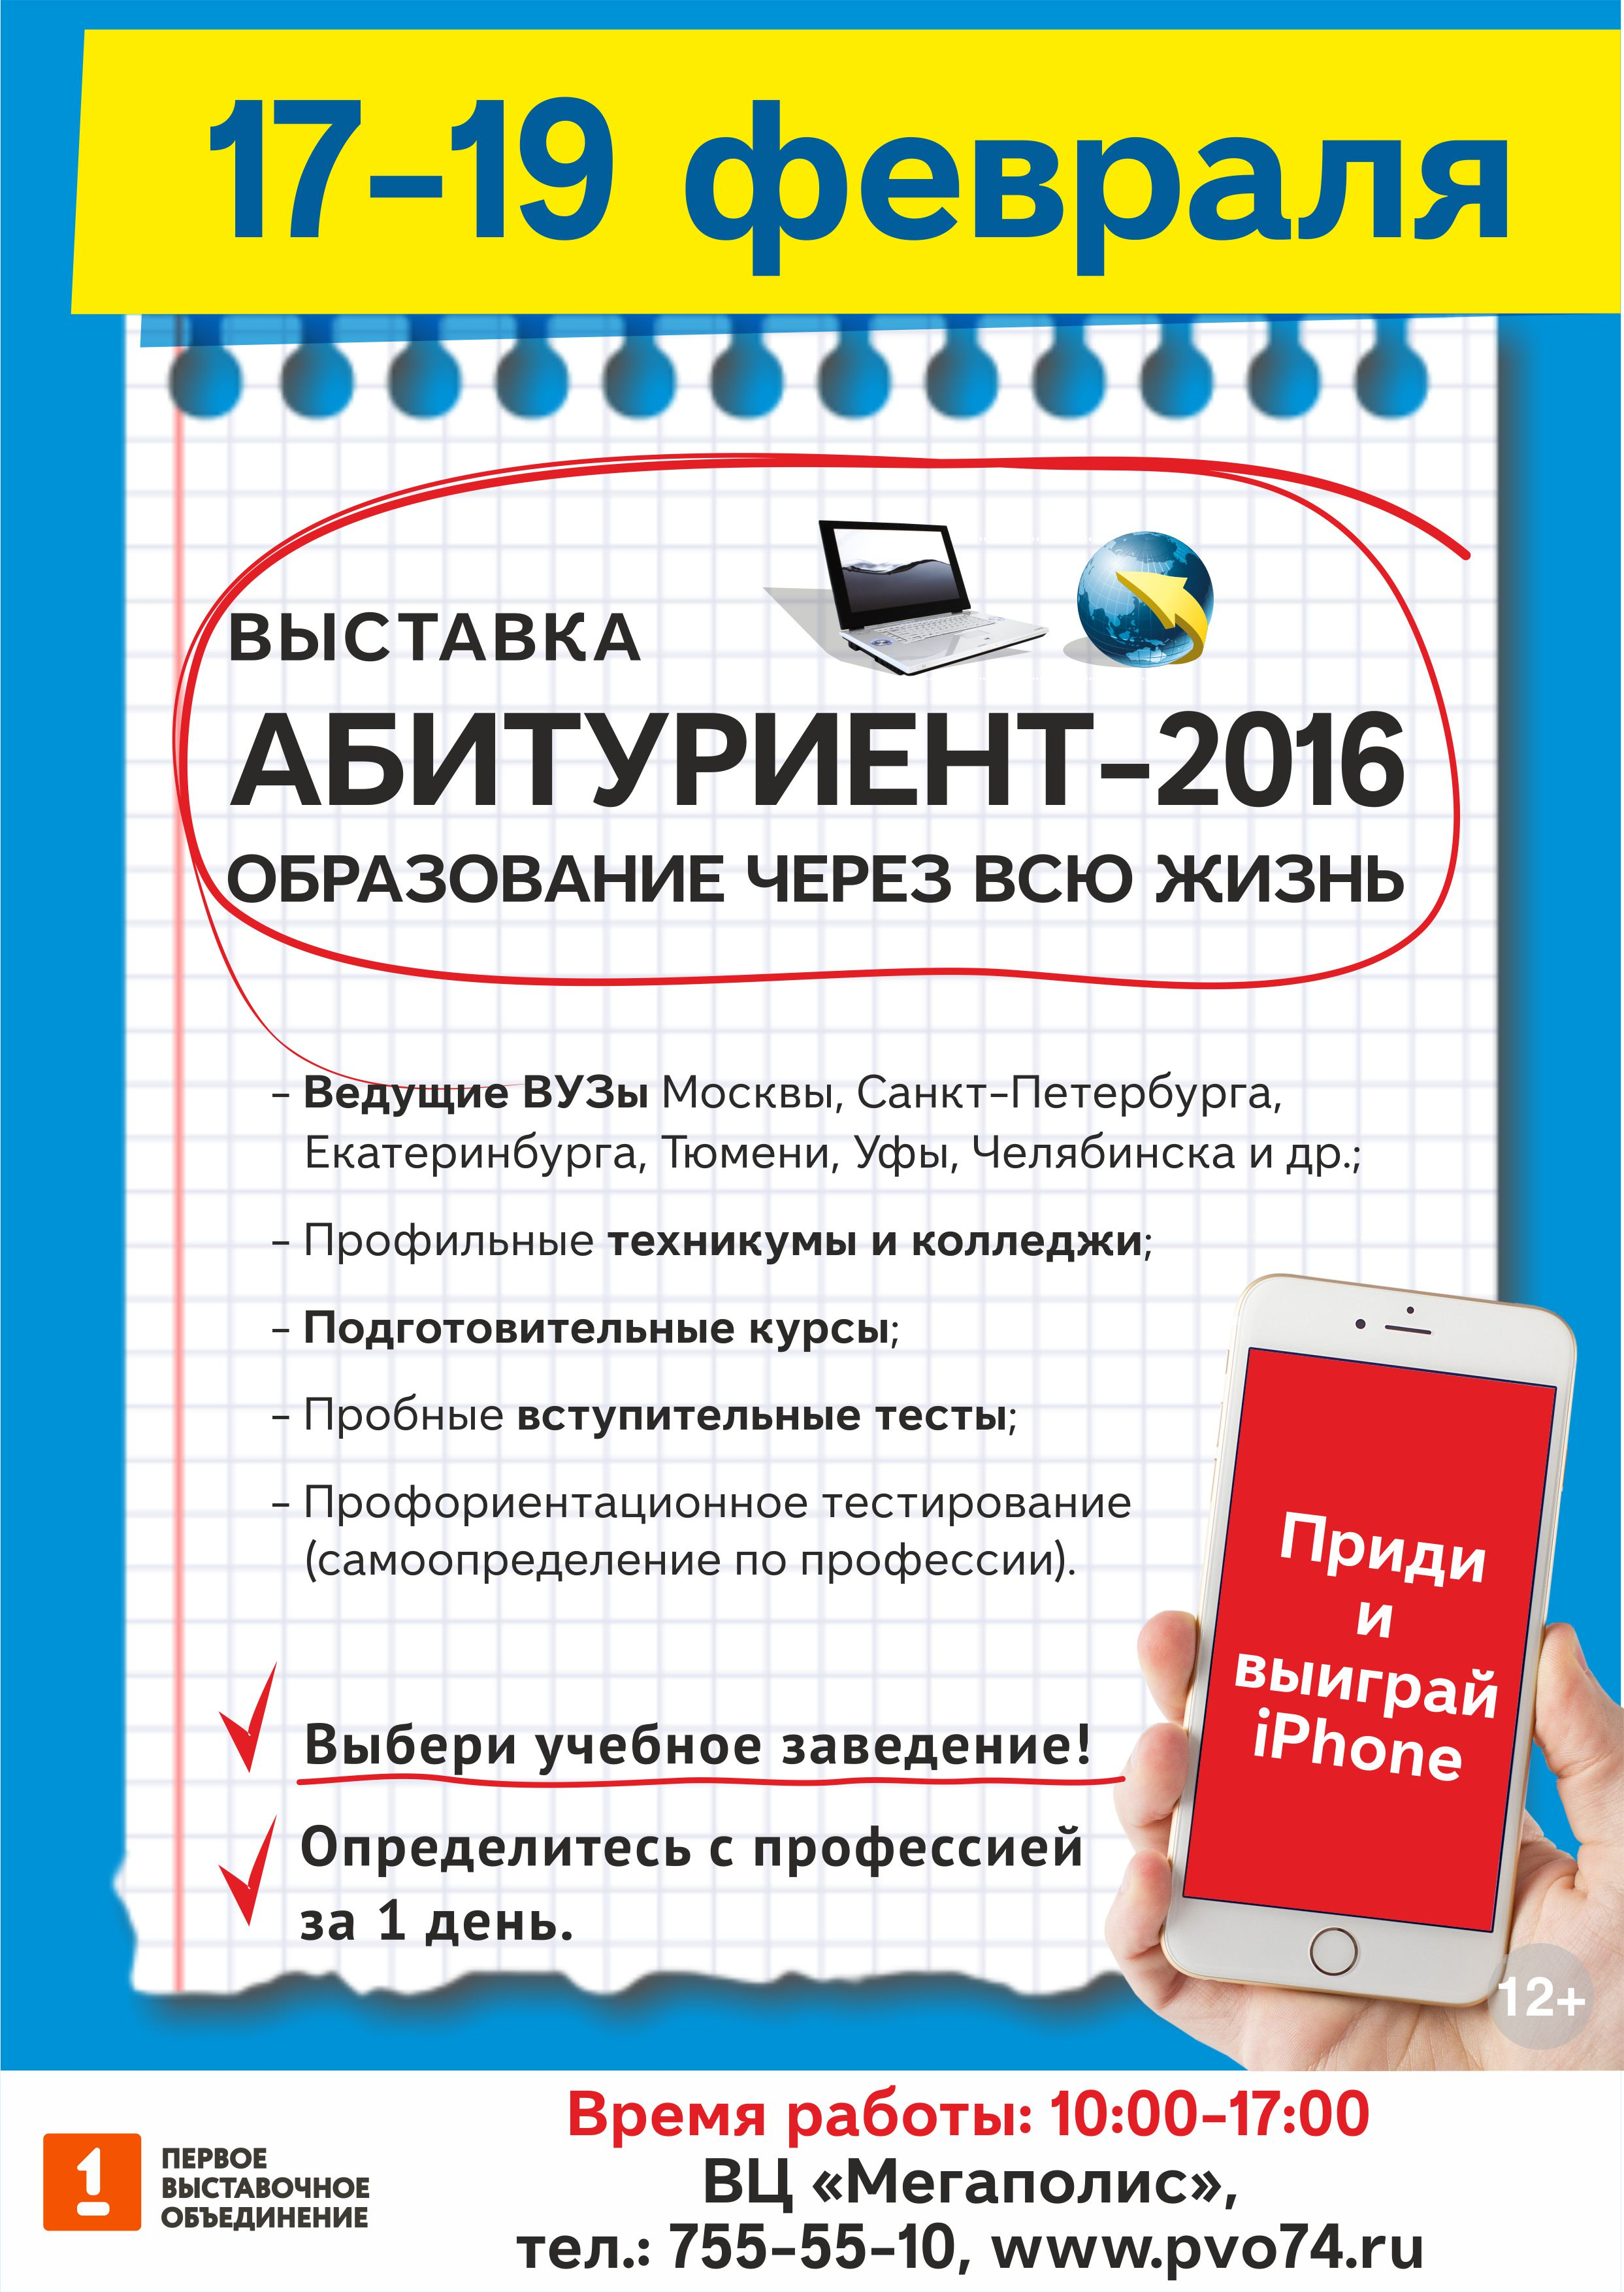 http://chel-edu.ru/pics/uploads/novosti/AFISHA-17-19-02-16.jpg